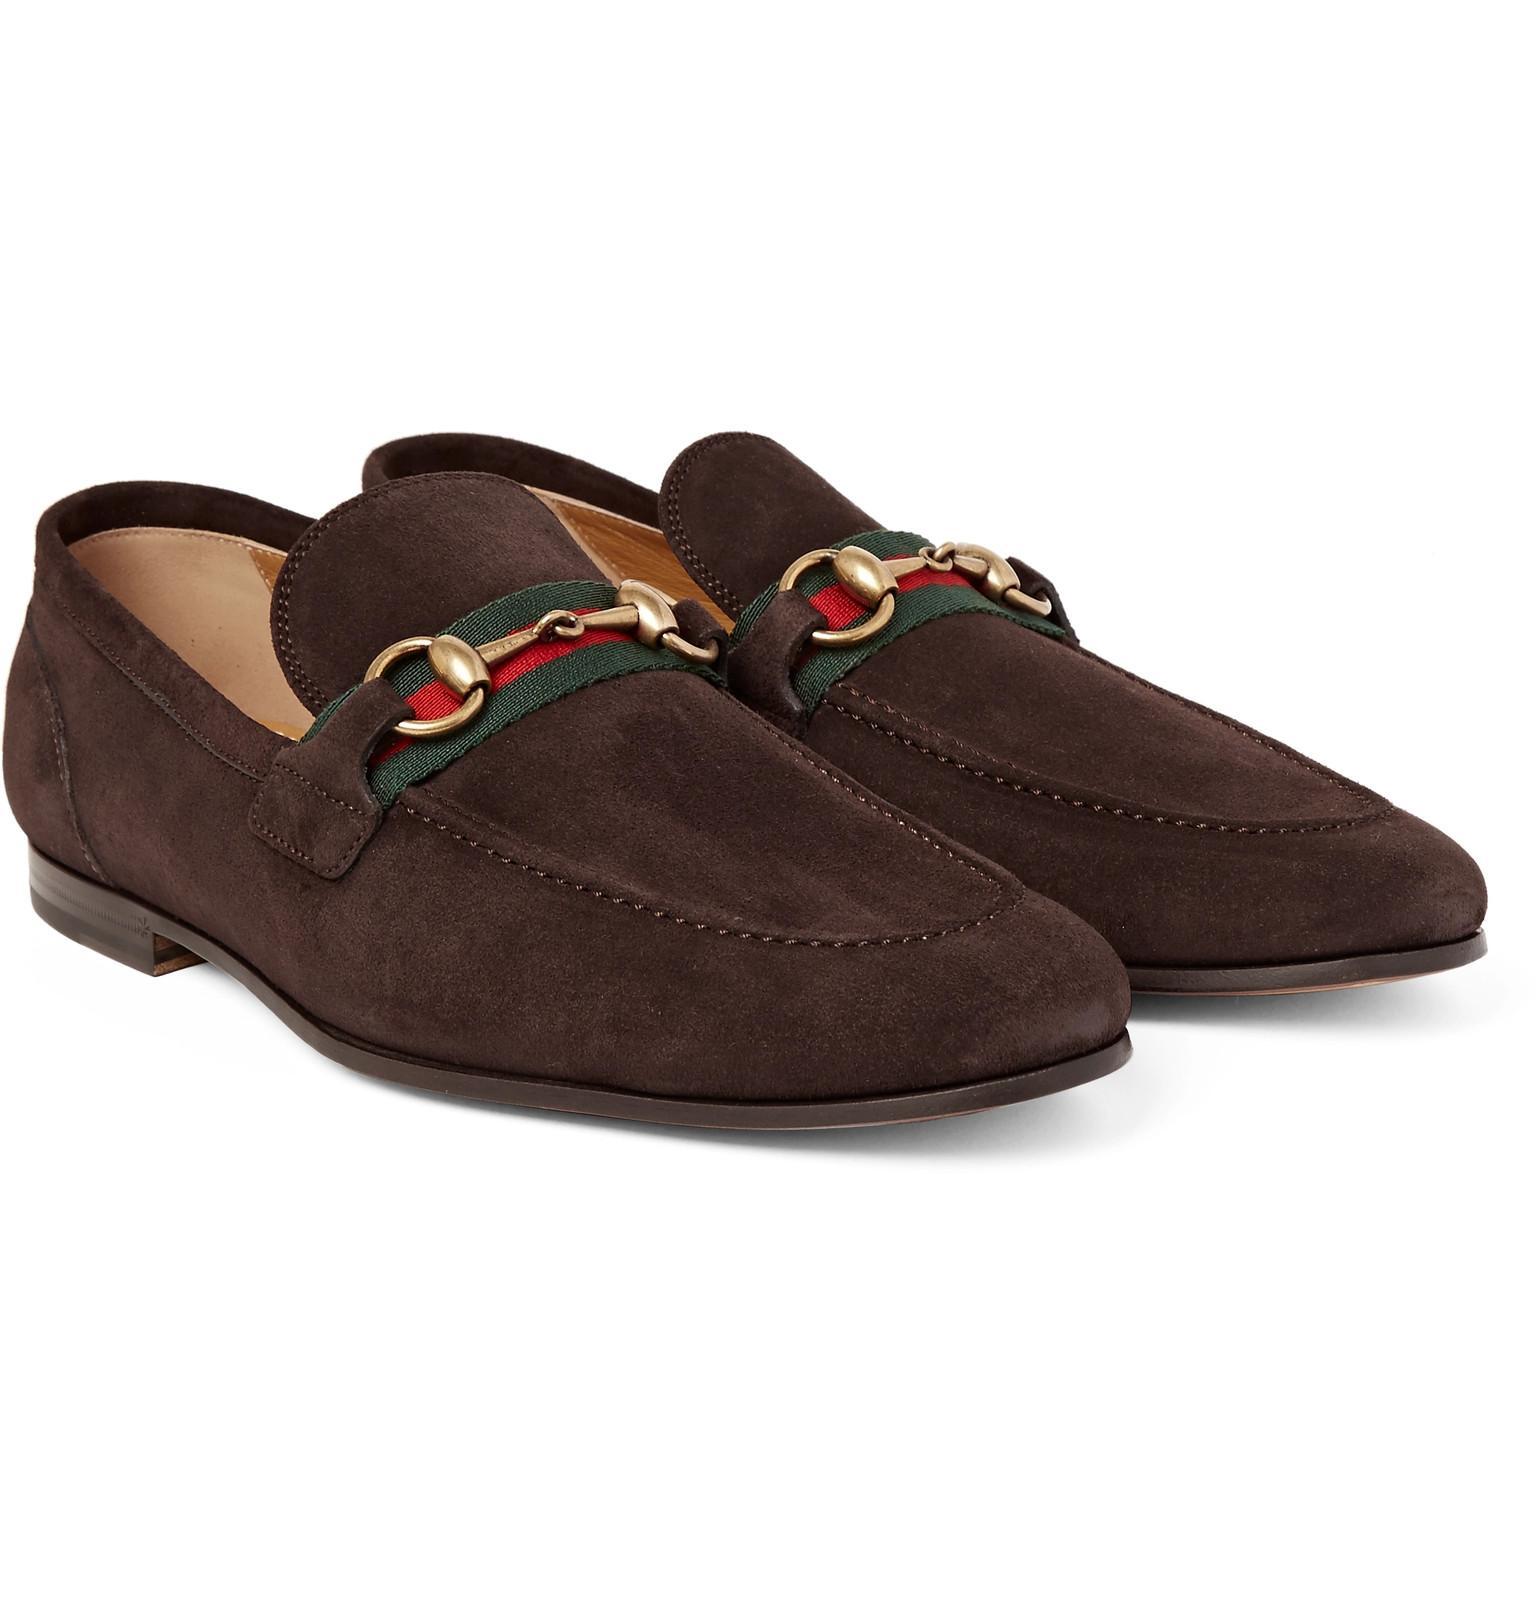 6676f28ce4b Mens Gucci Brown Horsebit Loafers